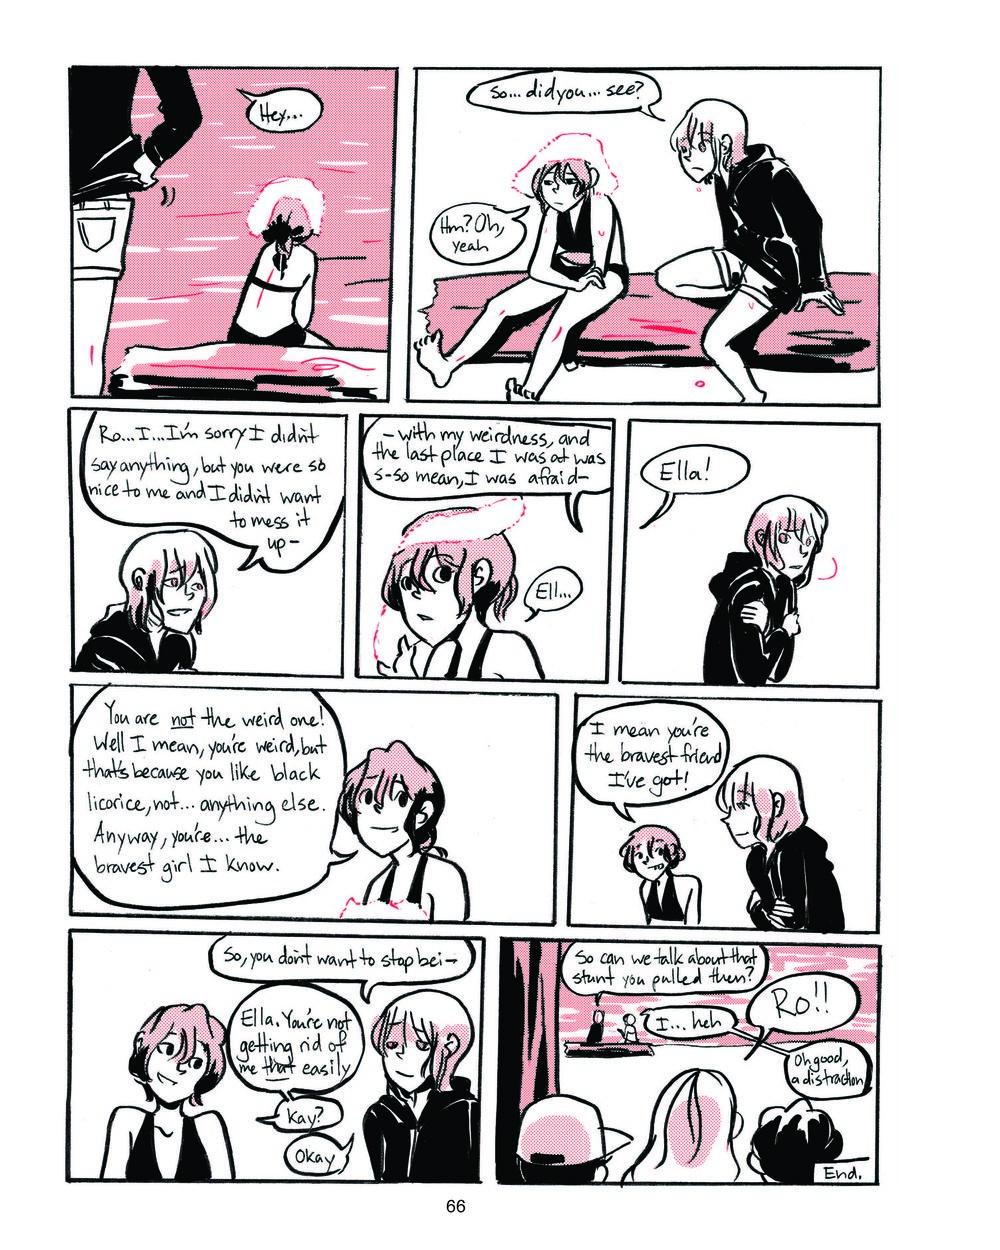 Lemonade_v2_Page_15.jpg